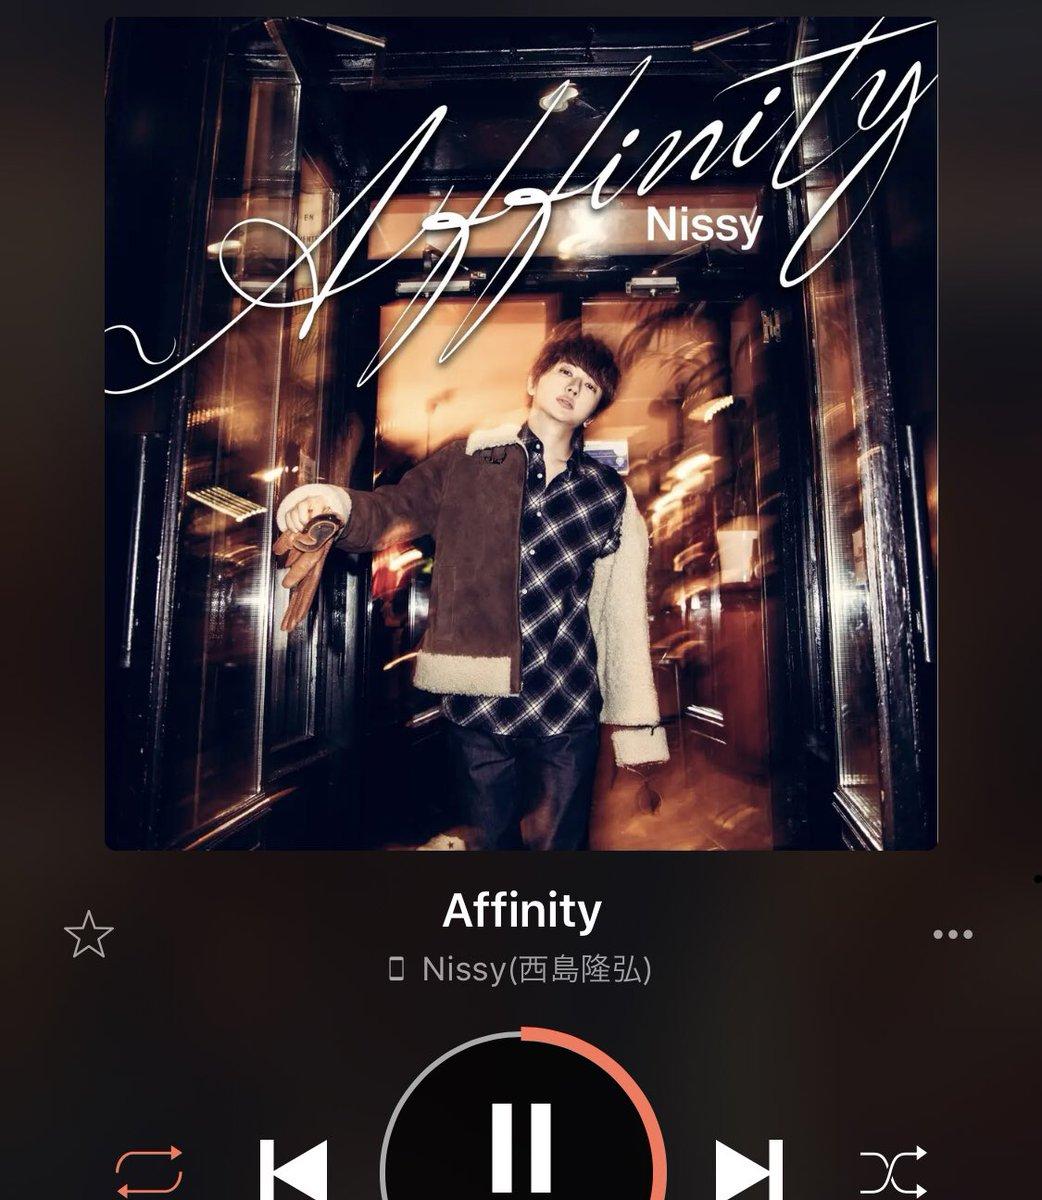 mN2*'s photo on #Affinity